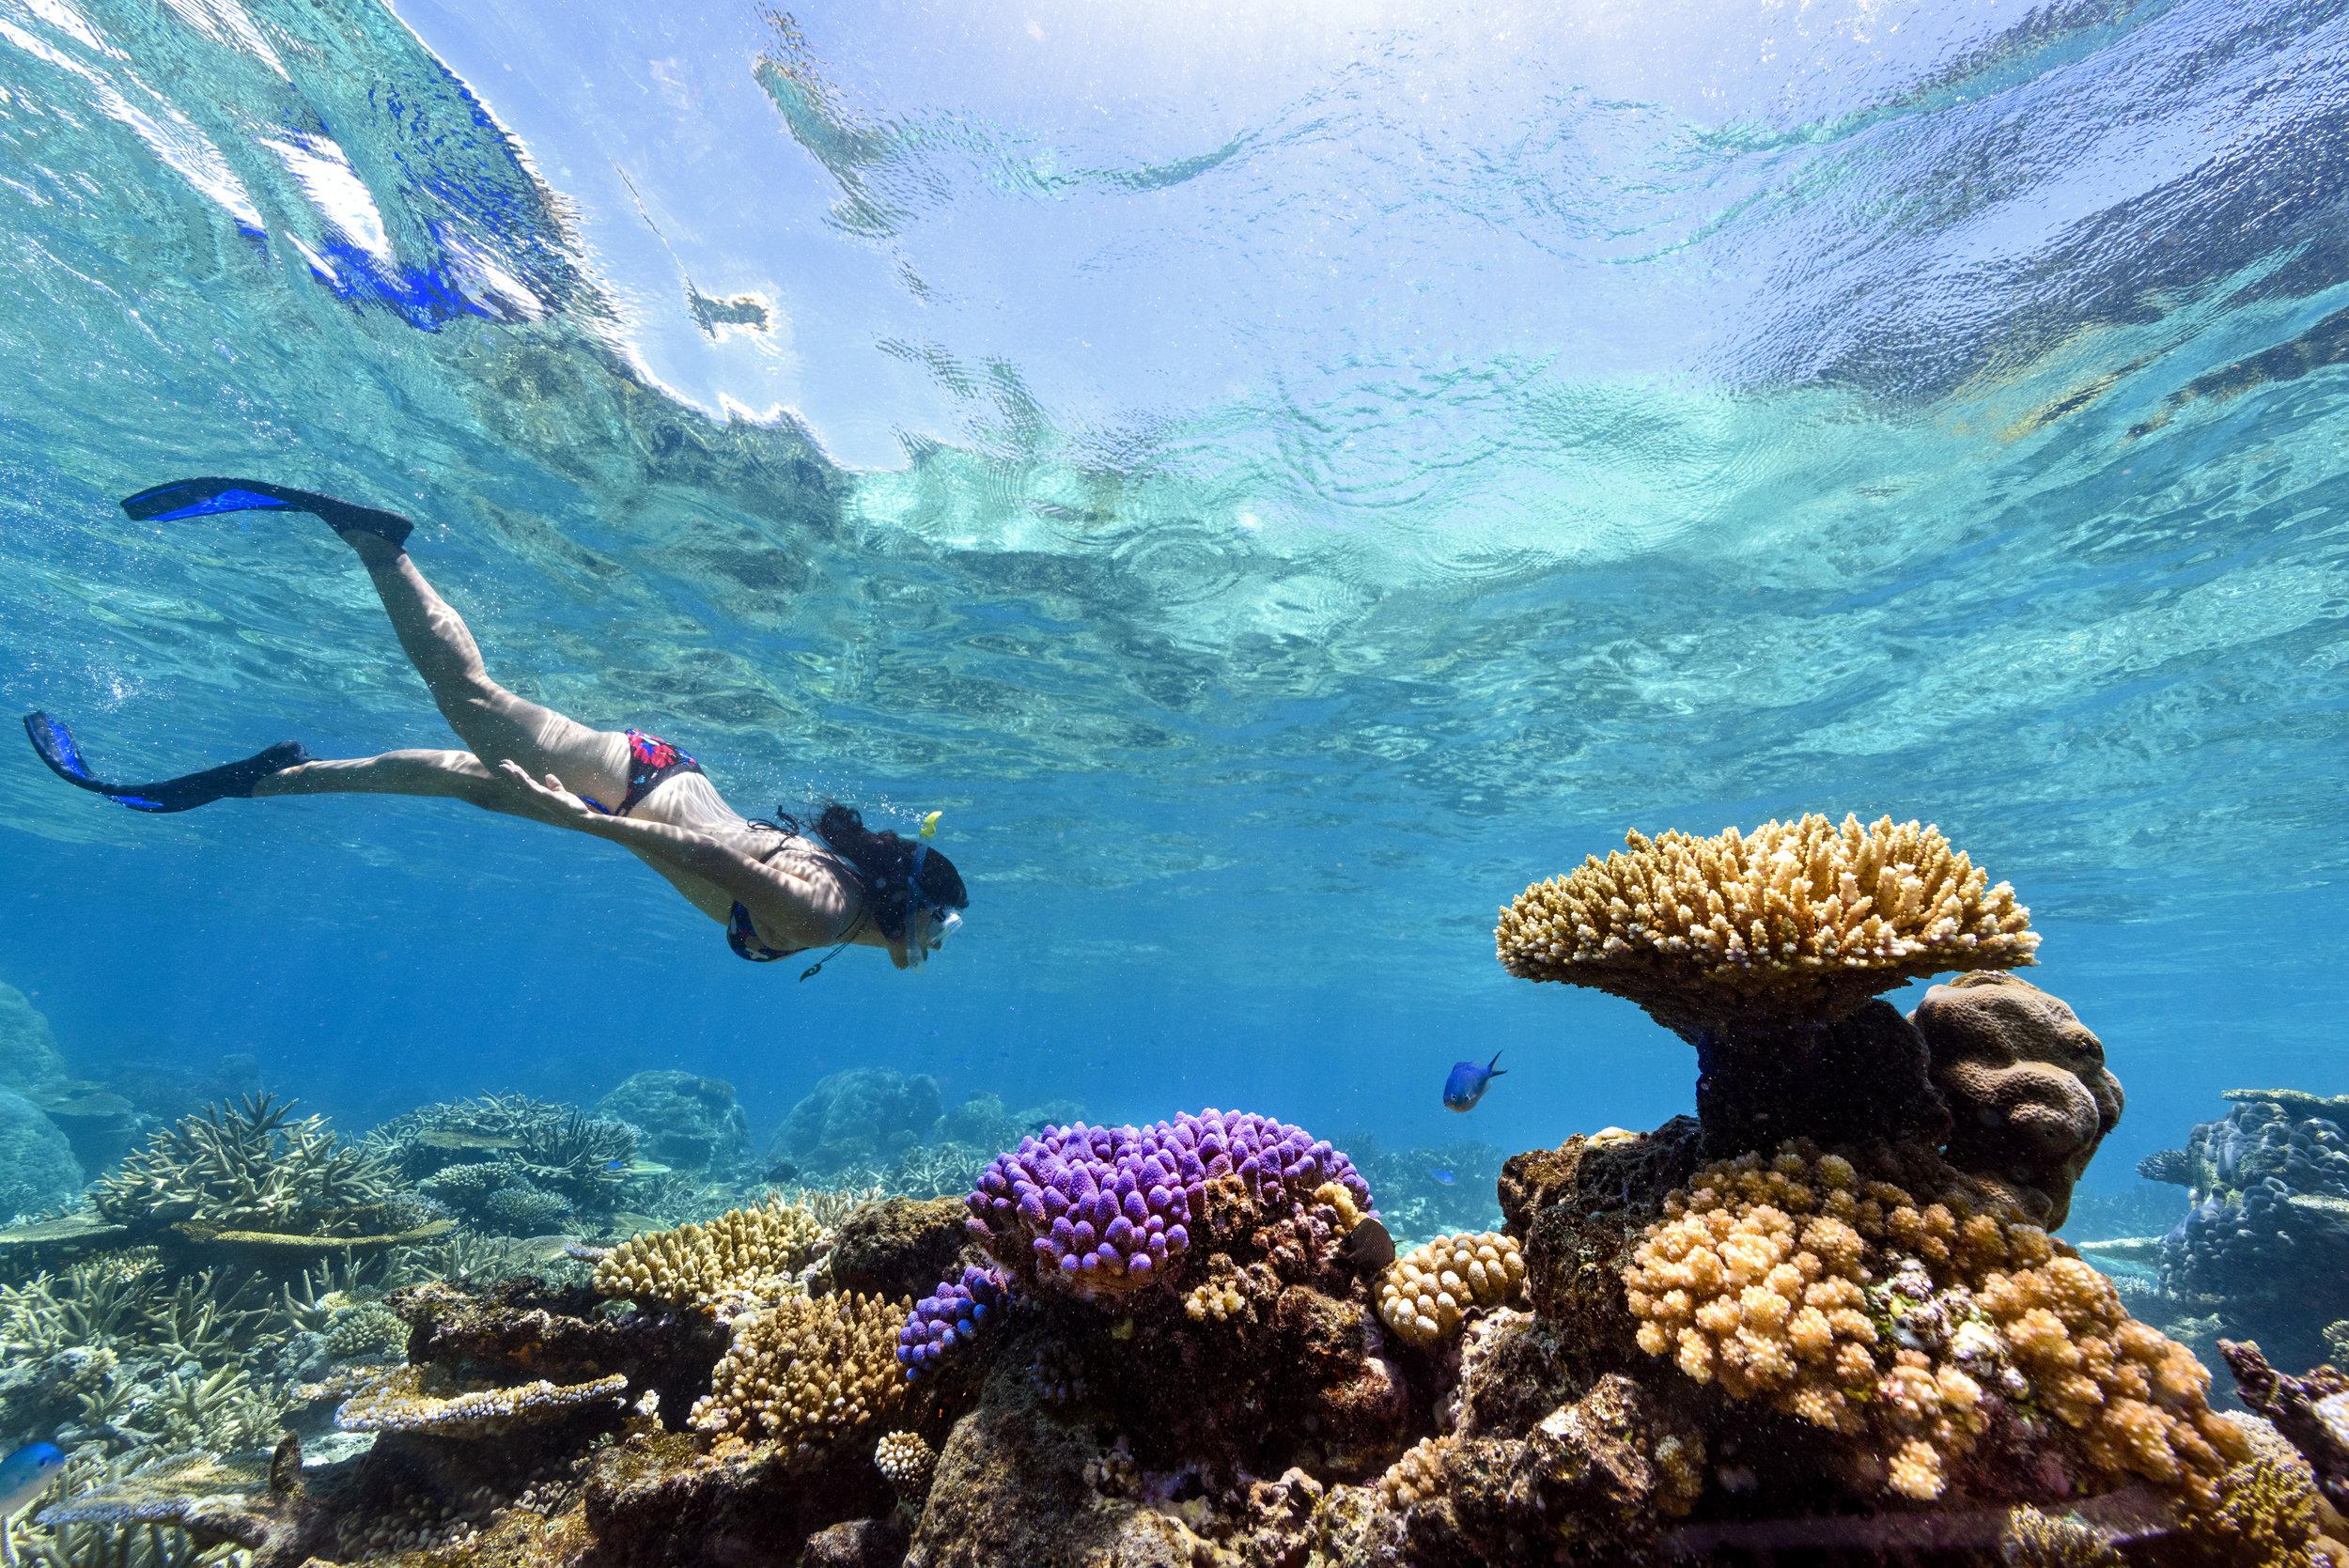 Fiji Best Resort Snorkeling - Rainbow Reef5.jpg